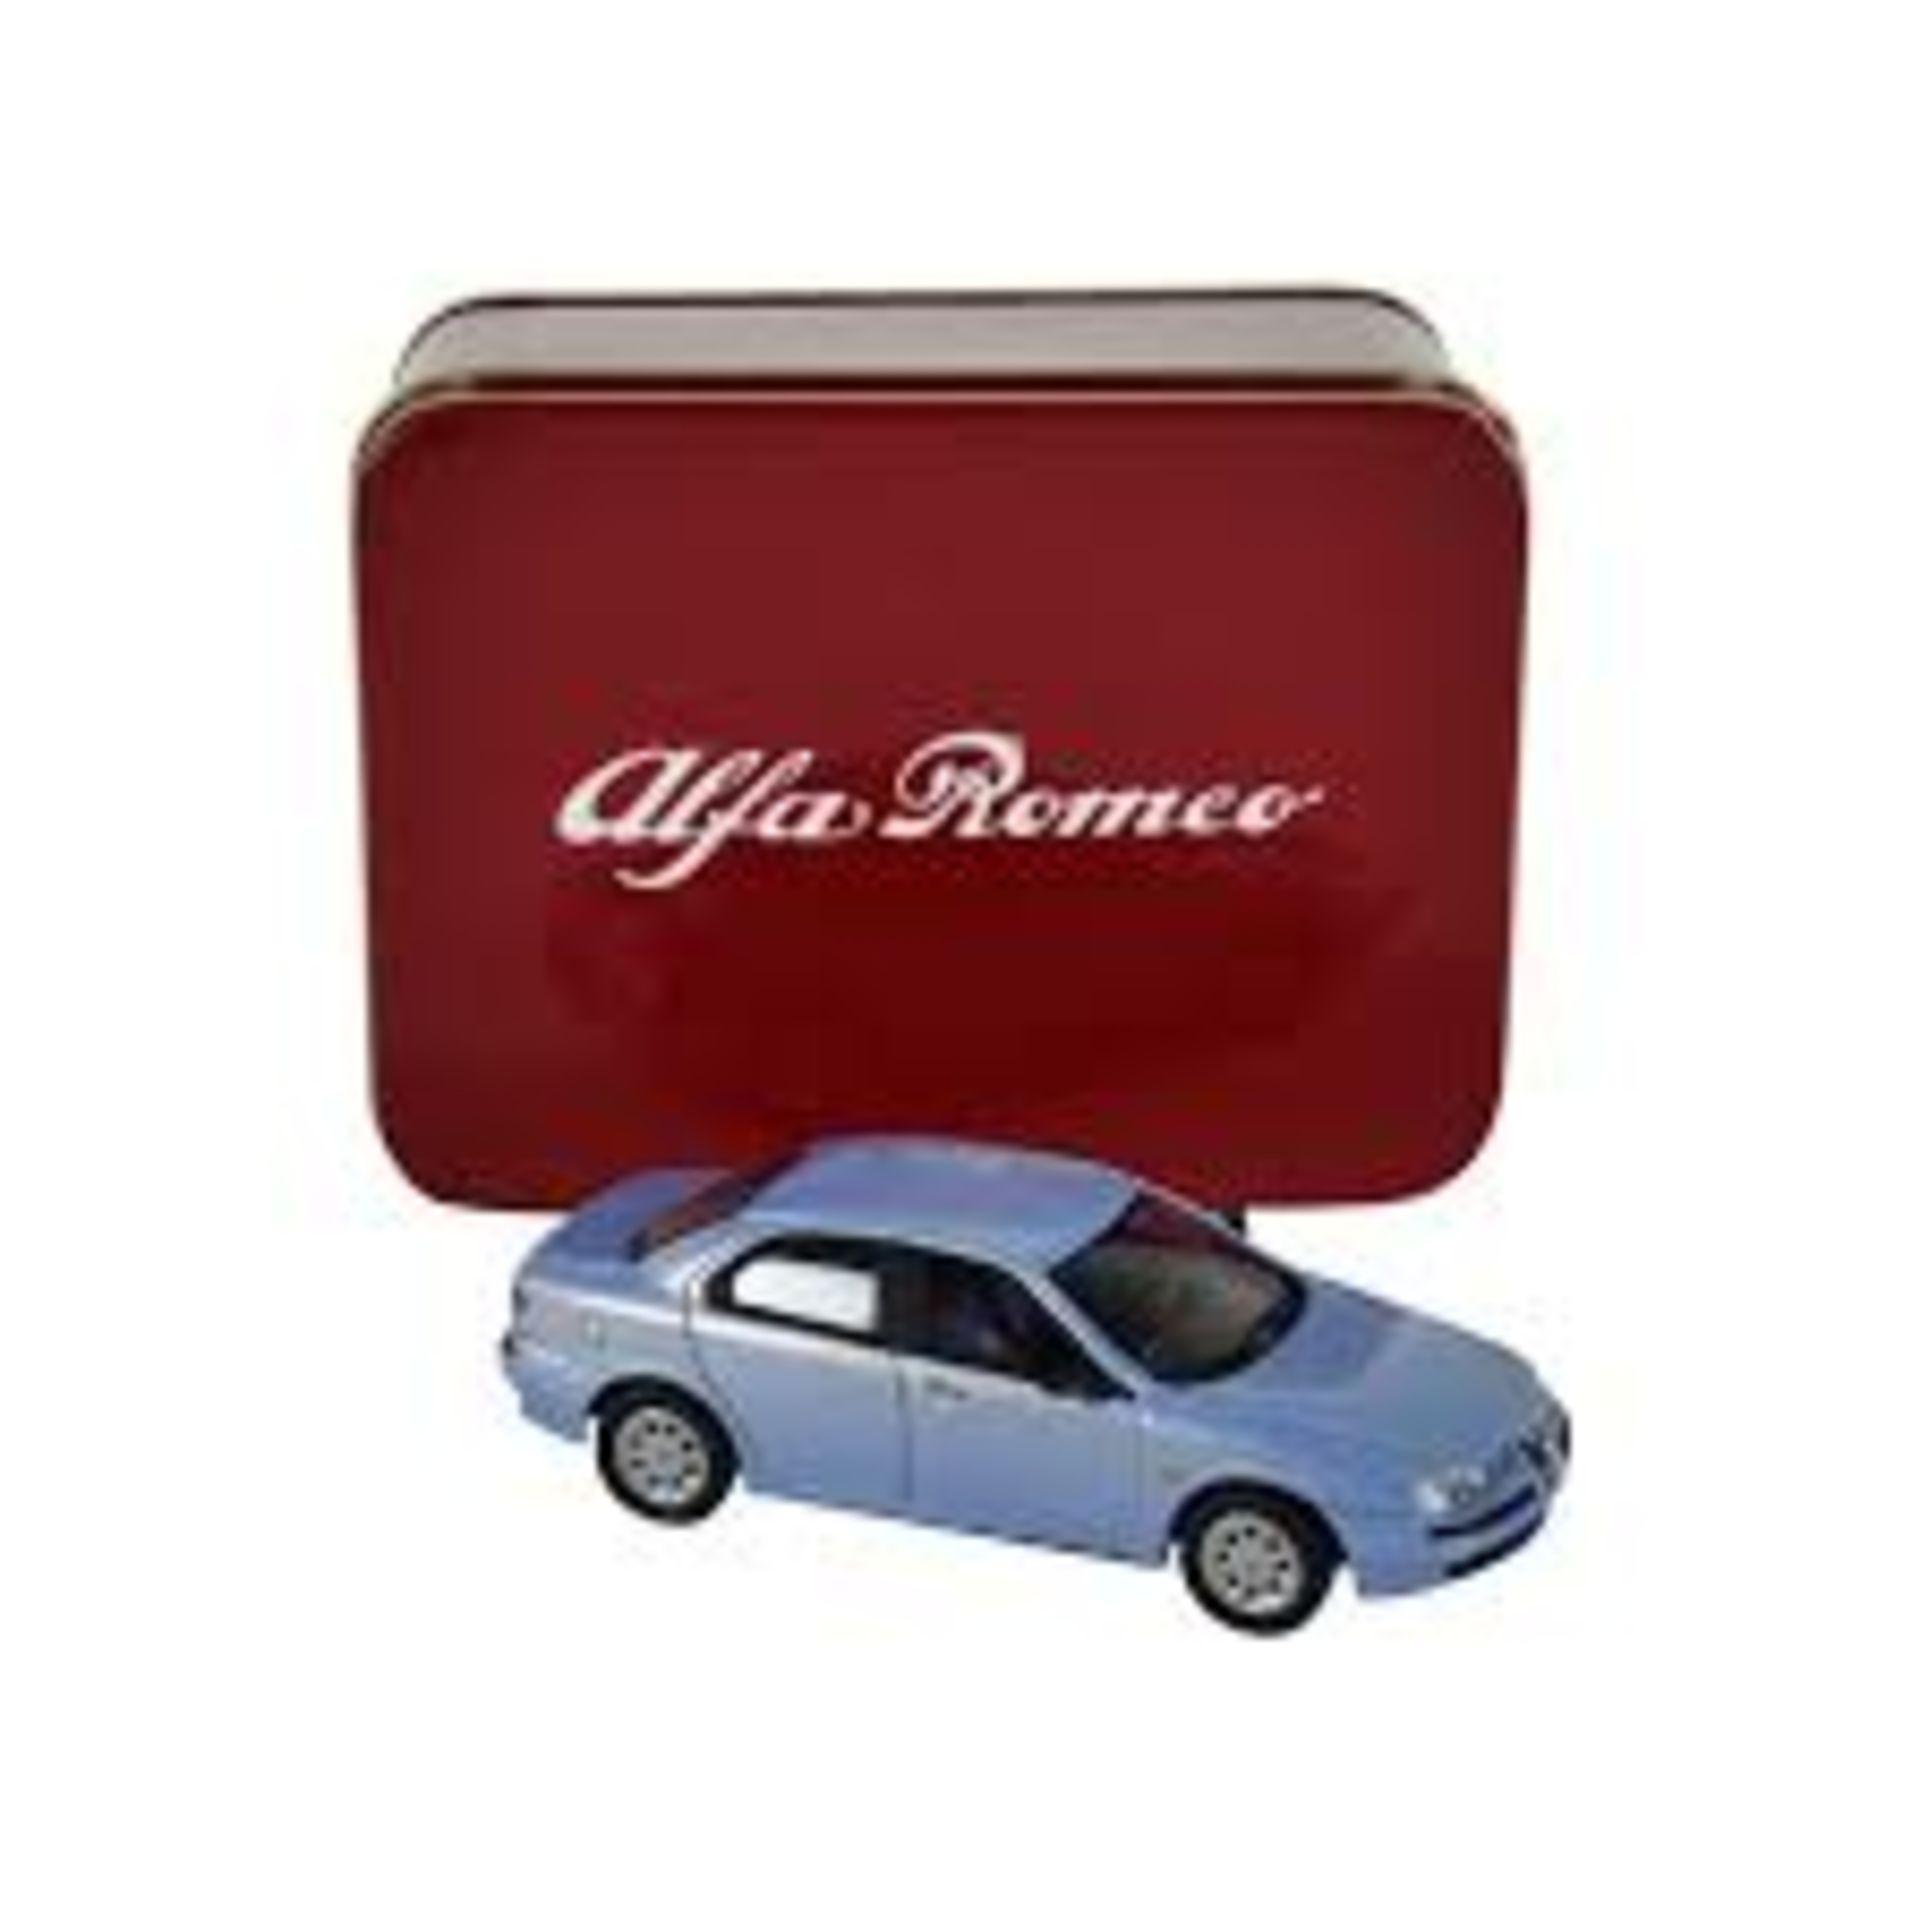 Lot 10367 - V Brand New 1/43 Diecast 1998 Alfa Romeo 156 - eBay Price £16.99